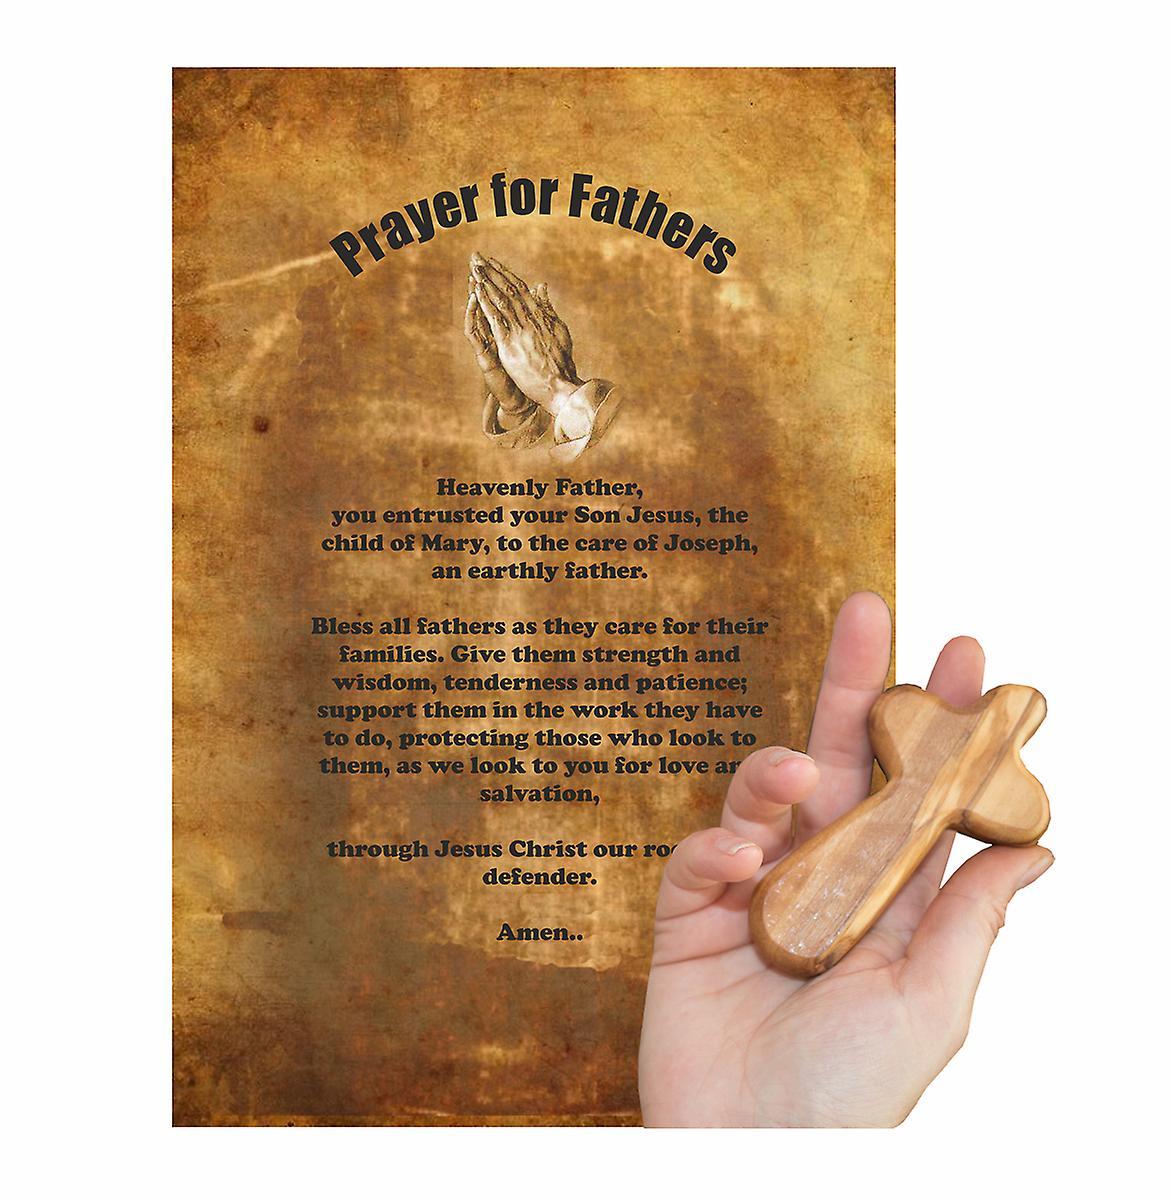 Prayer for Fatherhood Carved Olive Wood Comfort Cross Religious Keepsake Hand Made In Bethlehem